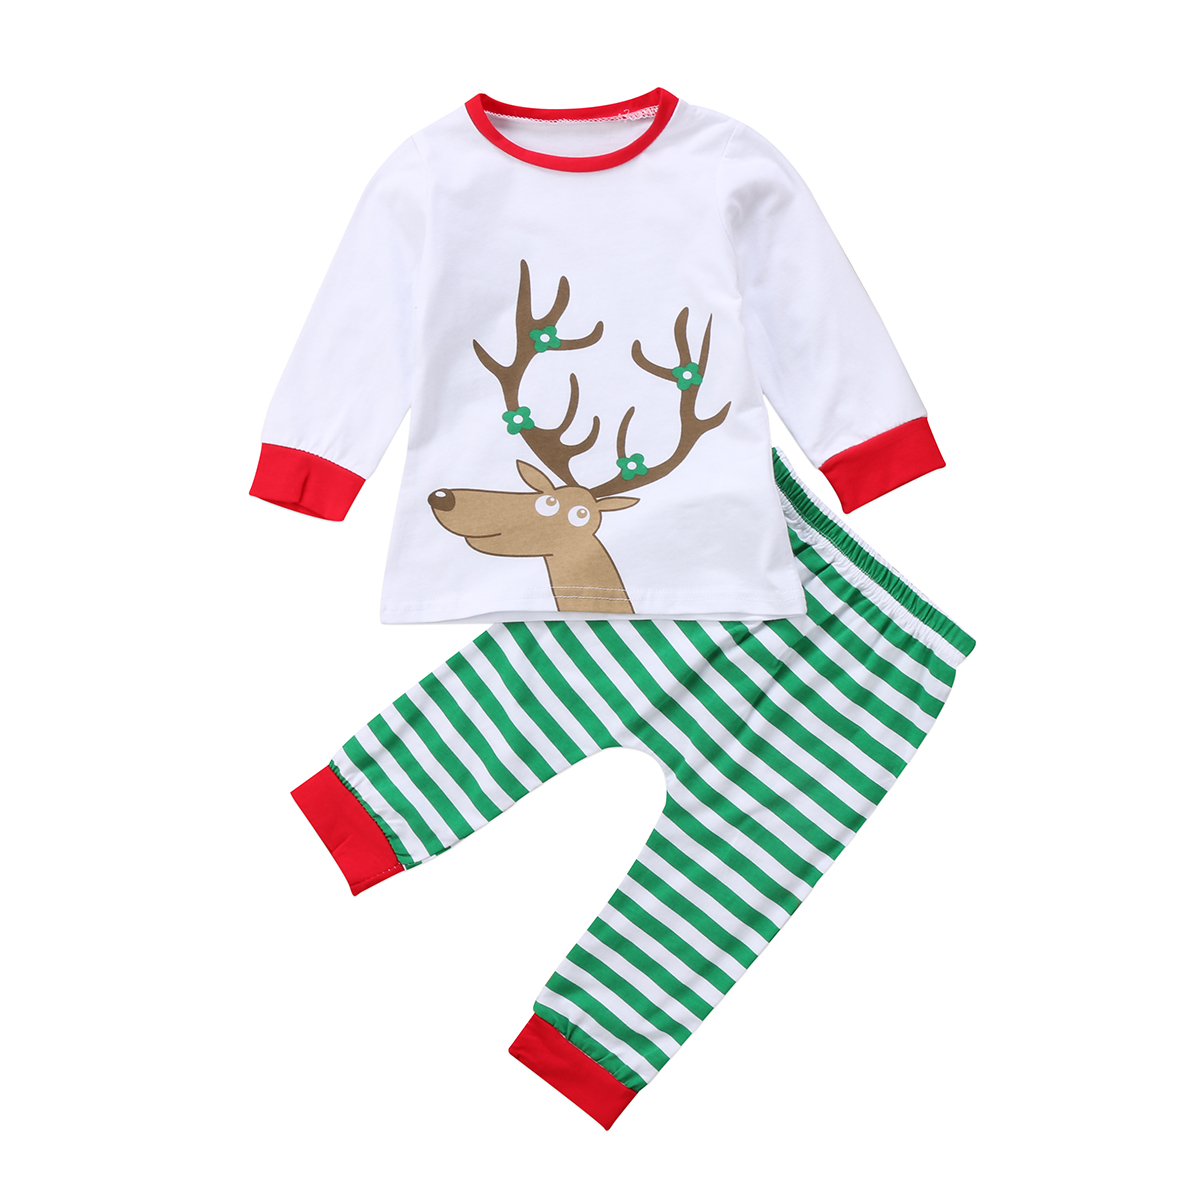 Cute Animal T shirt +Pants Leggings Set Jumpsuit Outfit Newborn Baby Boys Girls Kids Cotton Clothes Playsuit